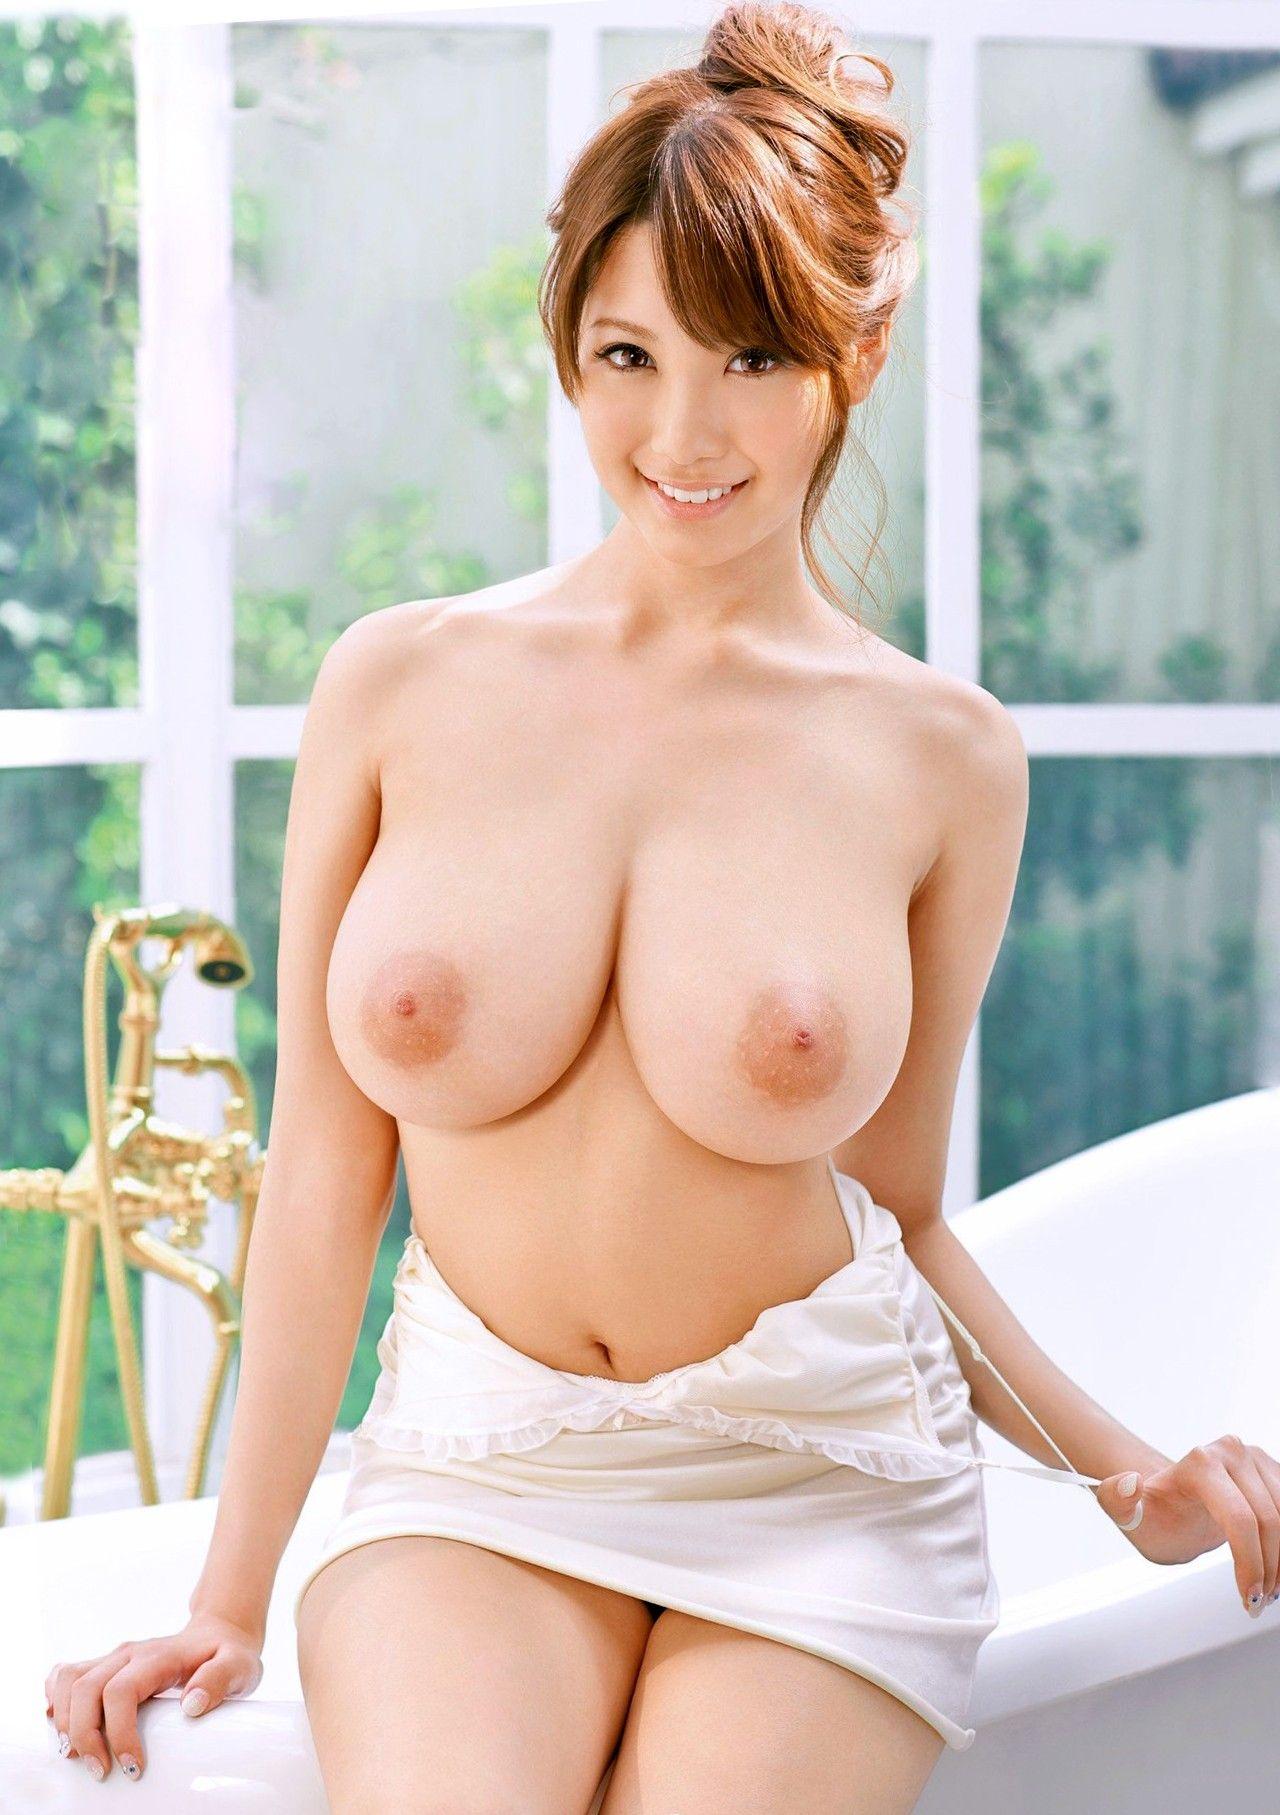 Nice tits pics